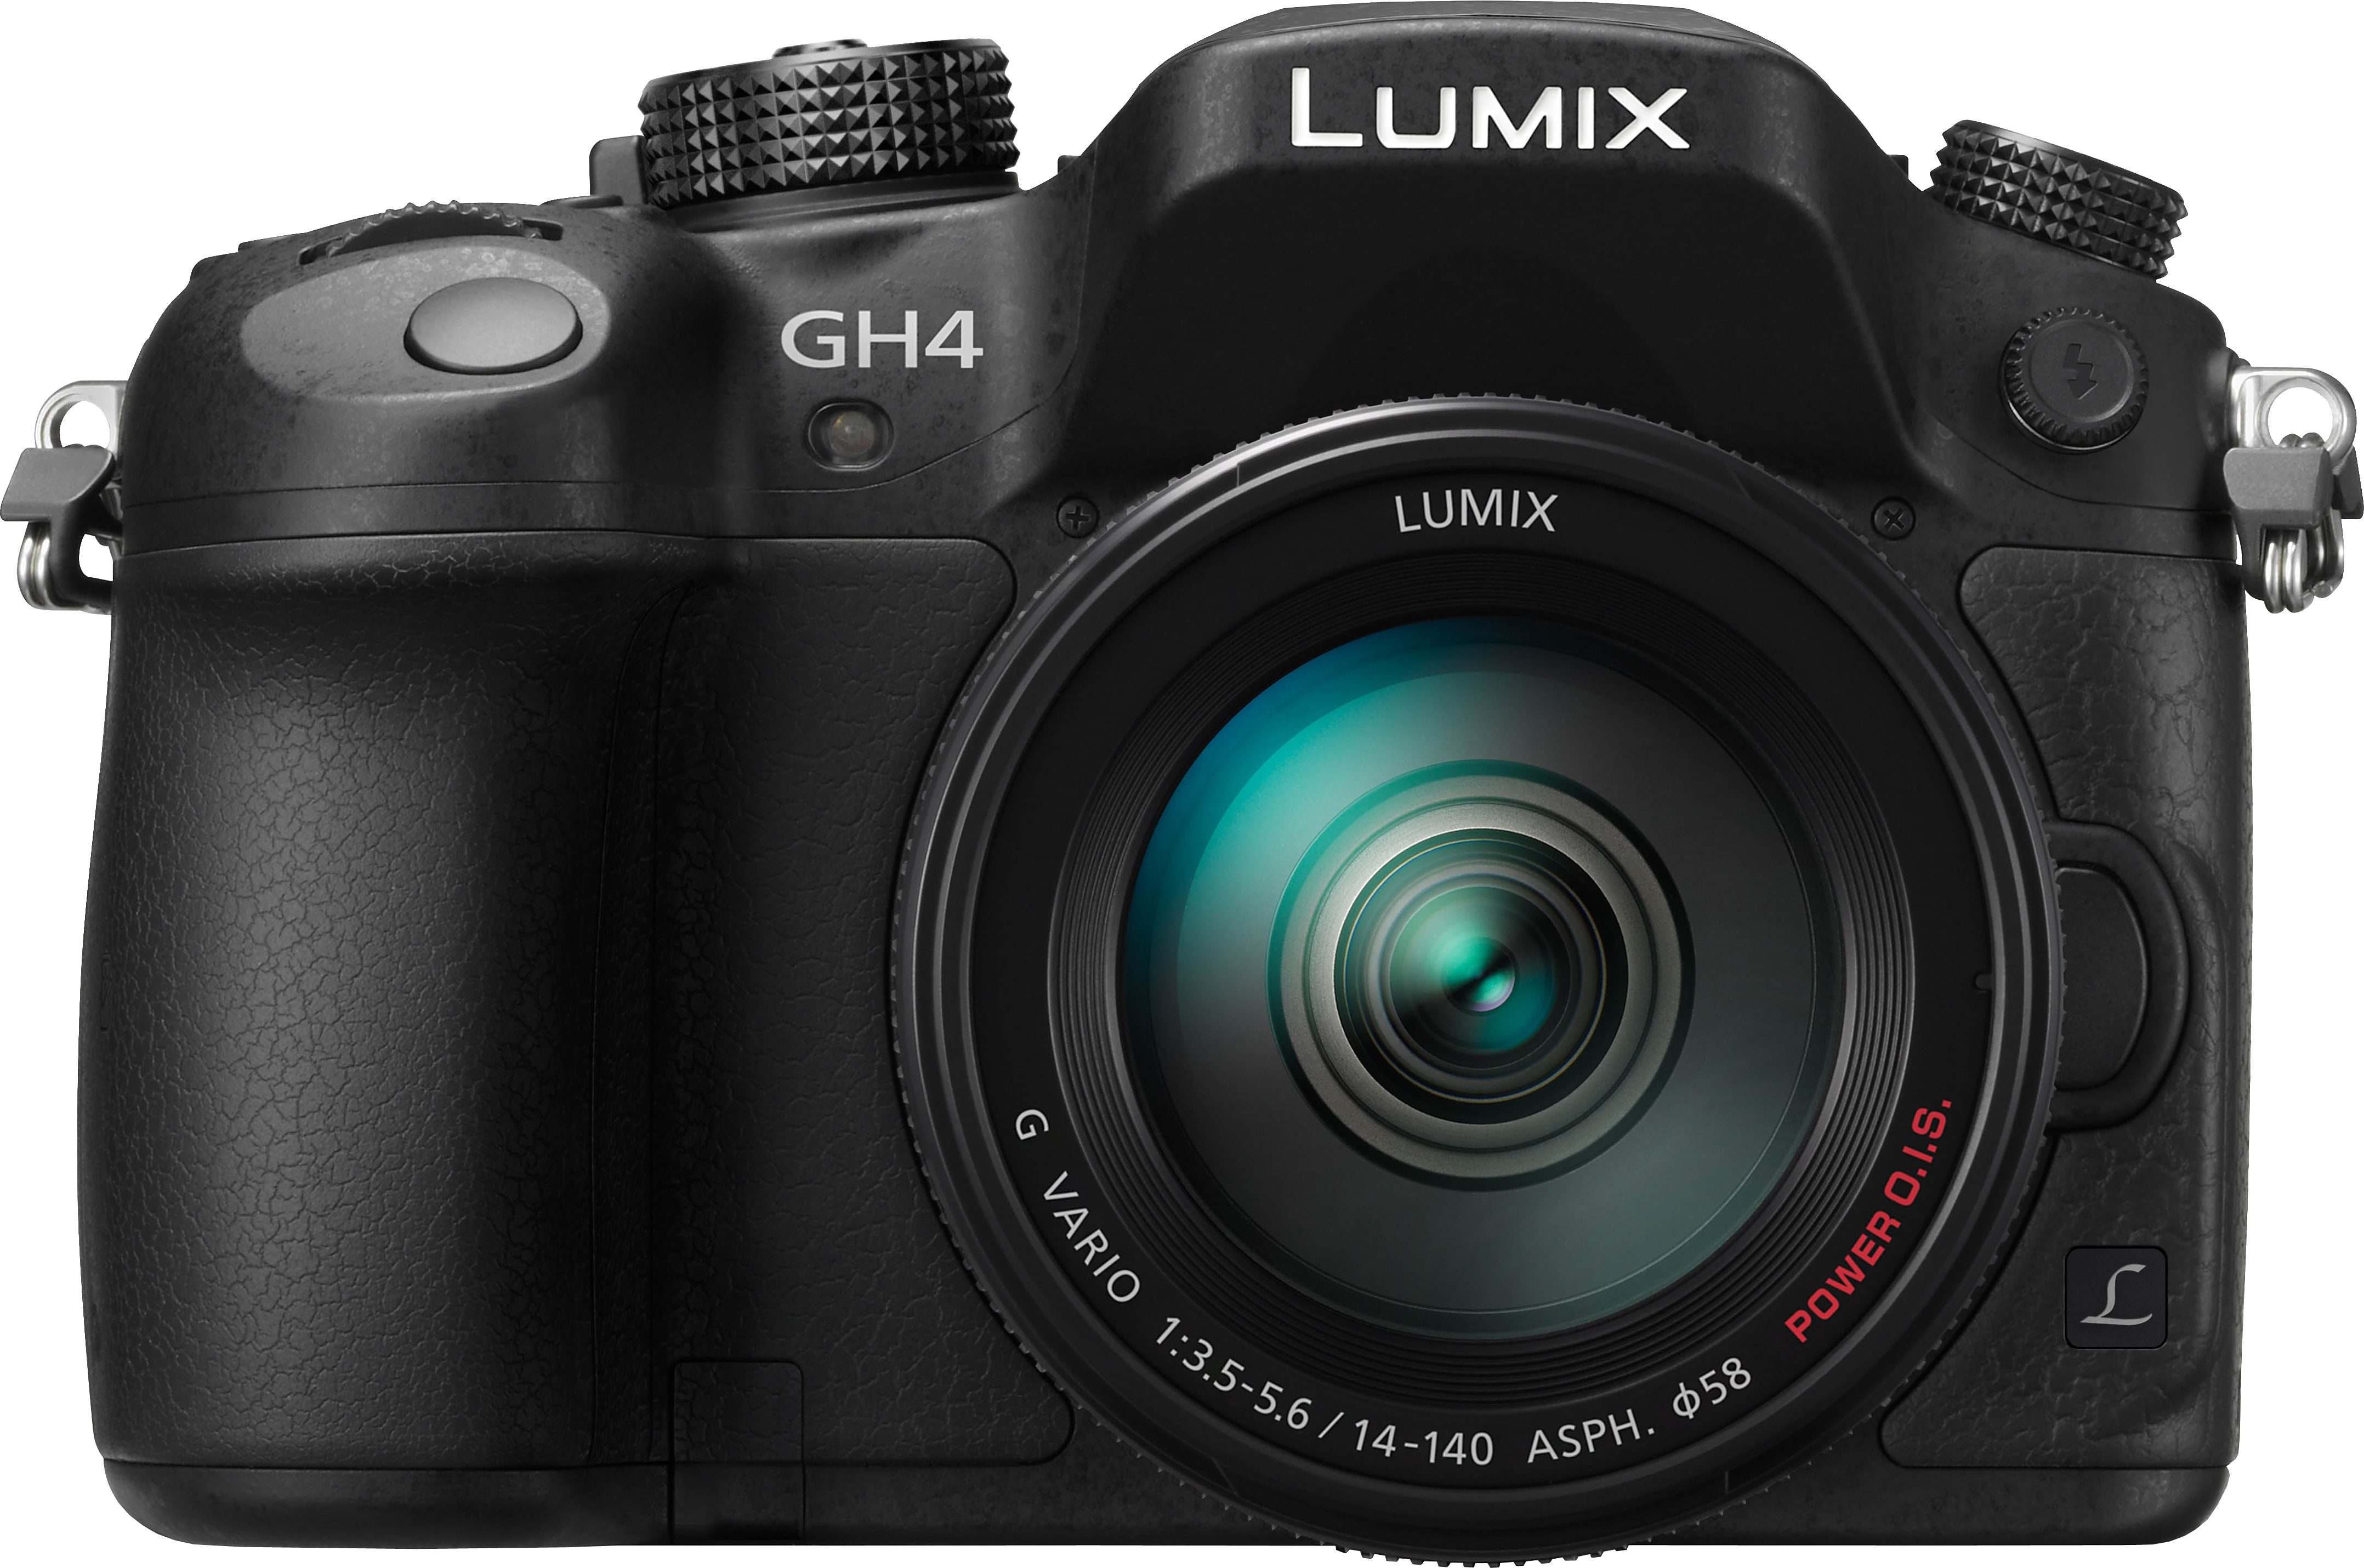 Lumix Panasonic DMC-GH4HEG-K System Kamera, LUMIX G VARIO 14-140 F3.5-5.6 ASPH. Zoom, 16 Megapixel